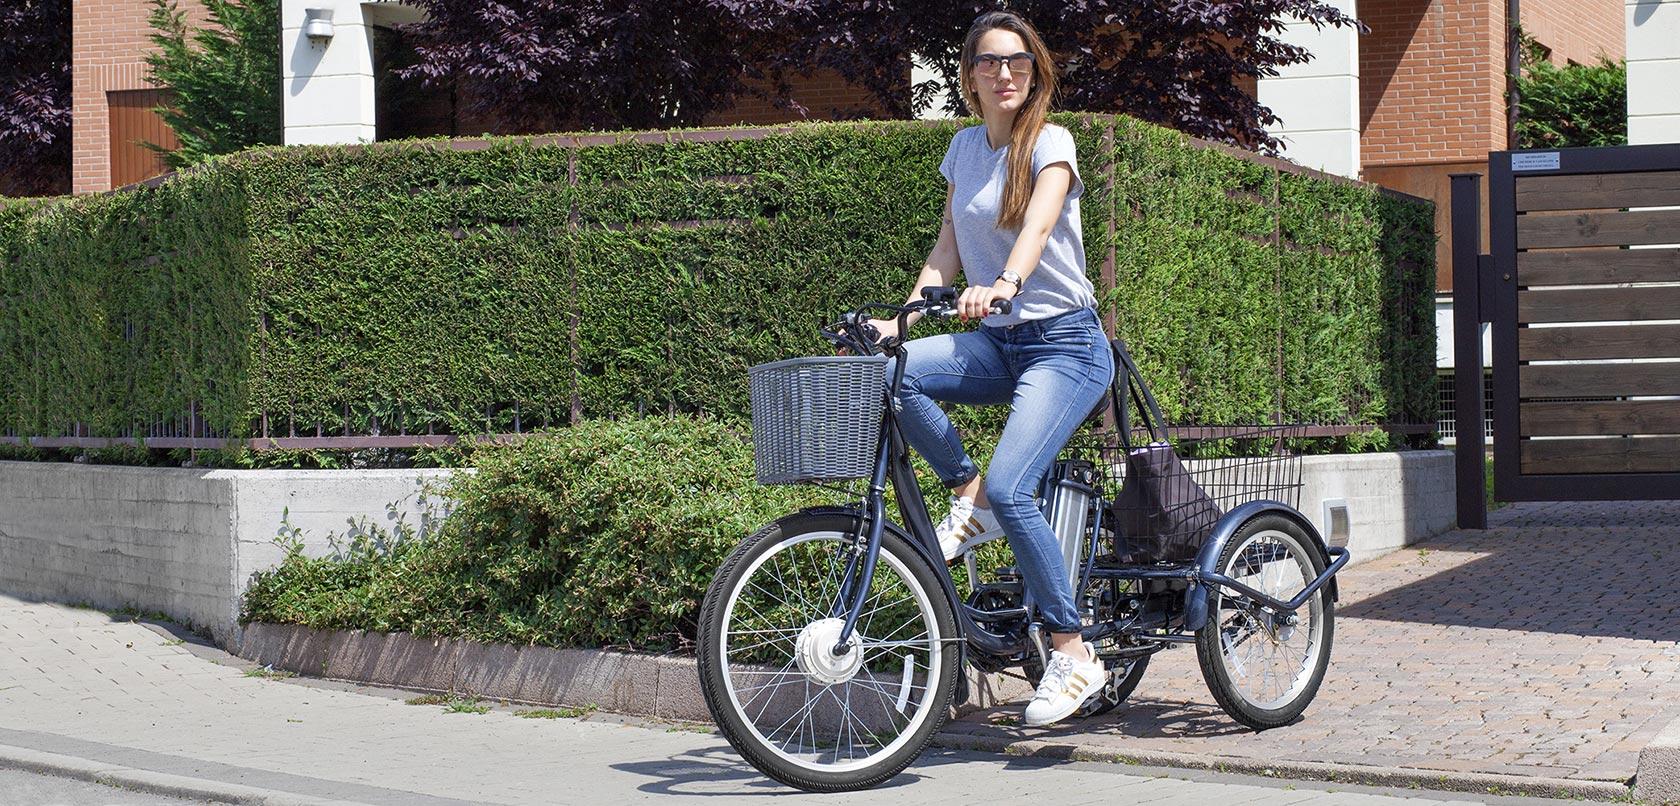 triciclo a pedalata assistita - Wy bicicletta elettrica